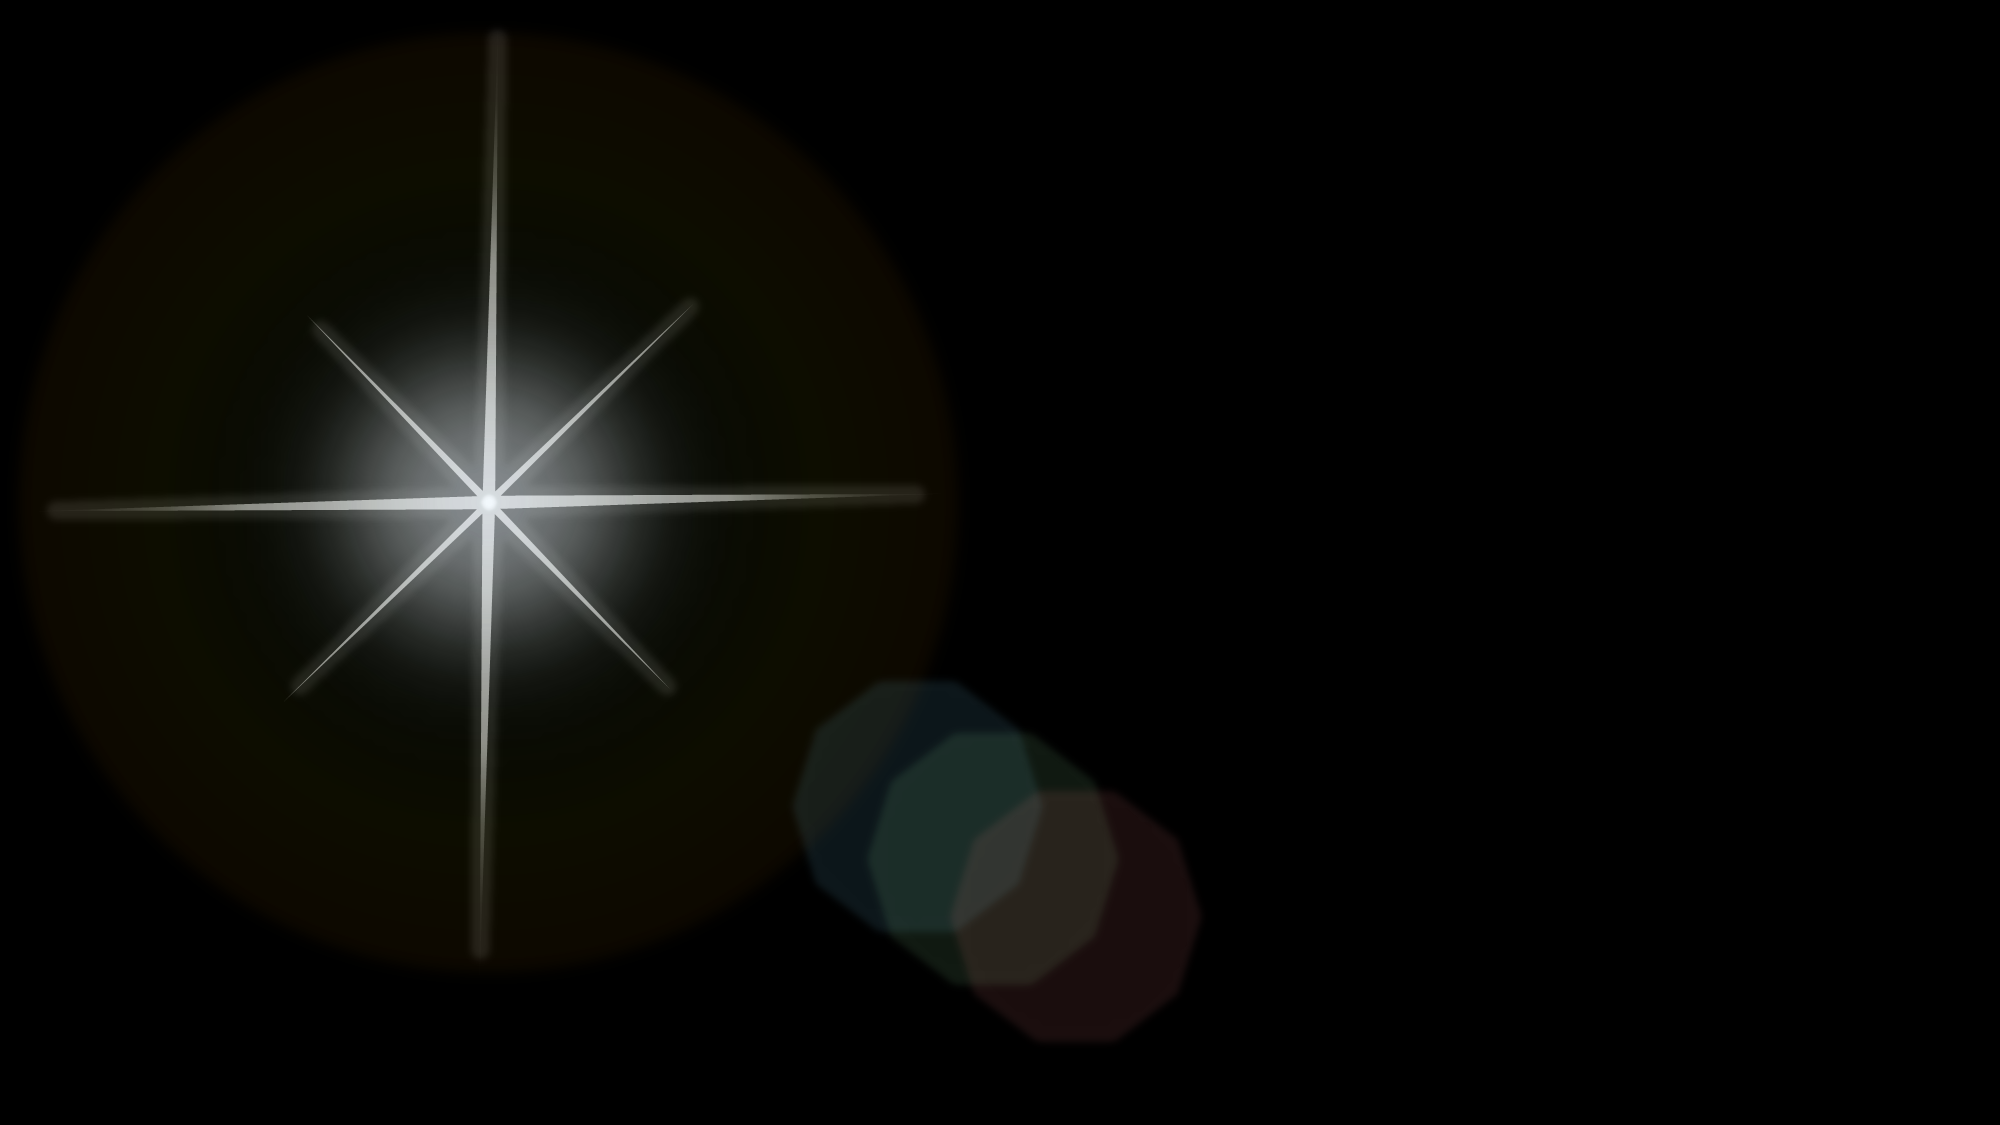 light glare effect on black background by